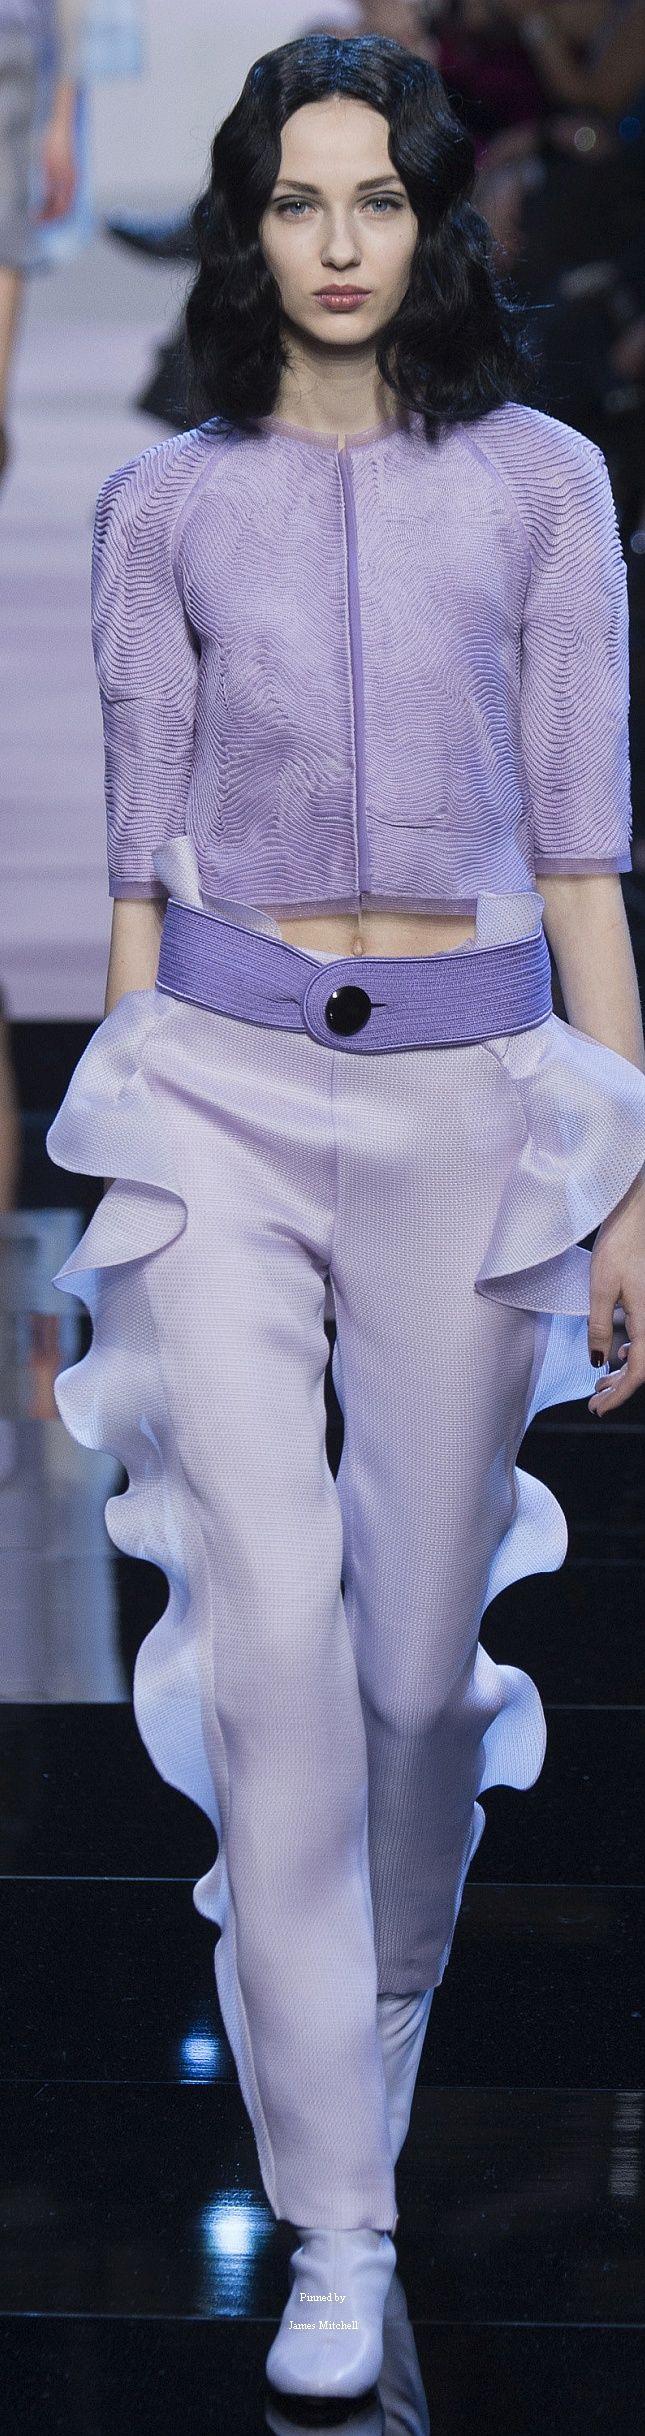 Armani Privé Collection Spring 2016 Couture